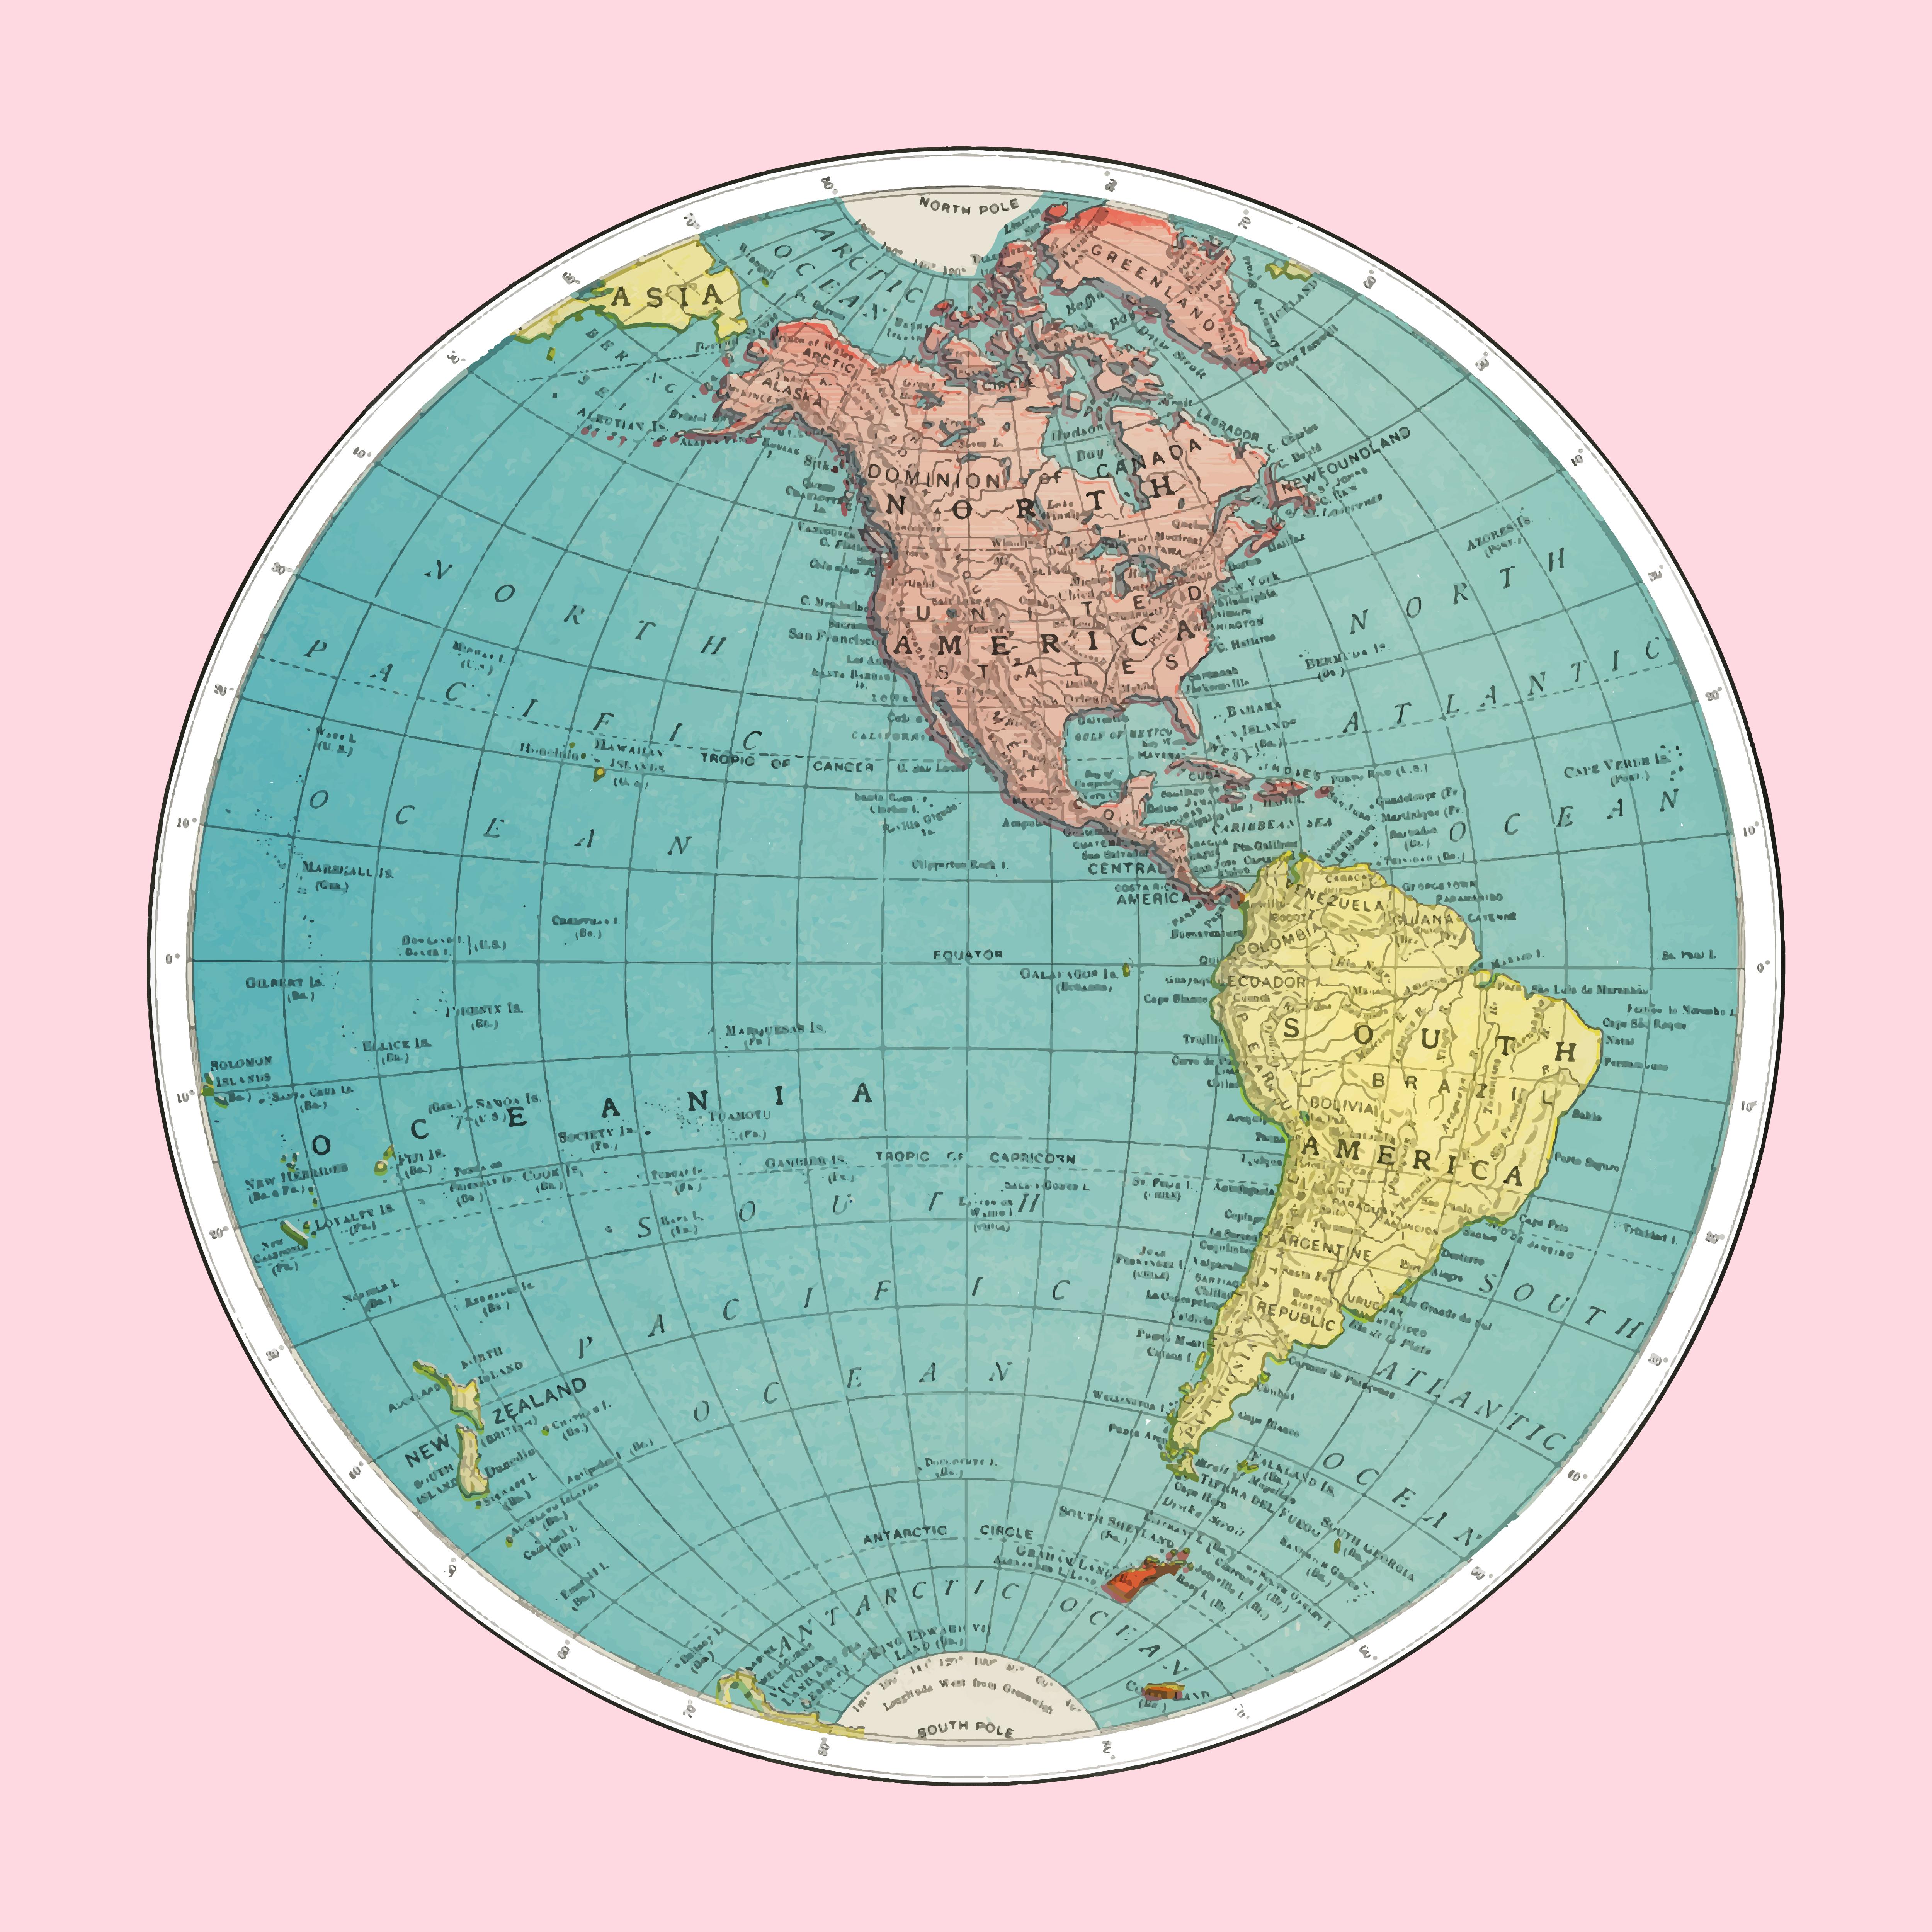 Western Hemisphere World Atlas By Rand Mcnally And Co